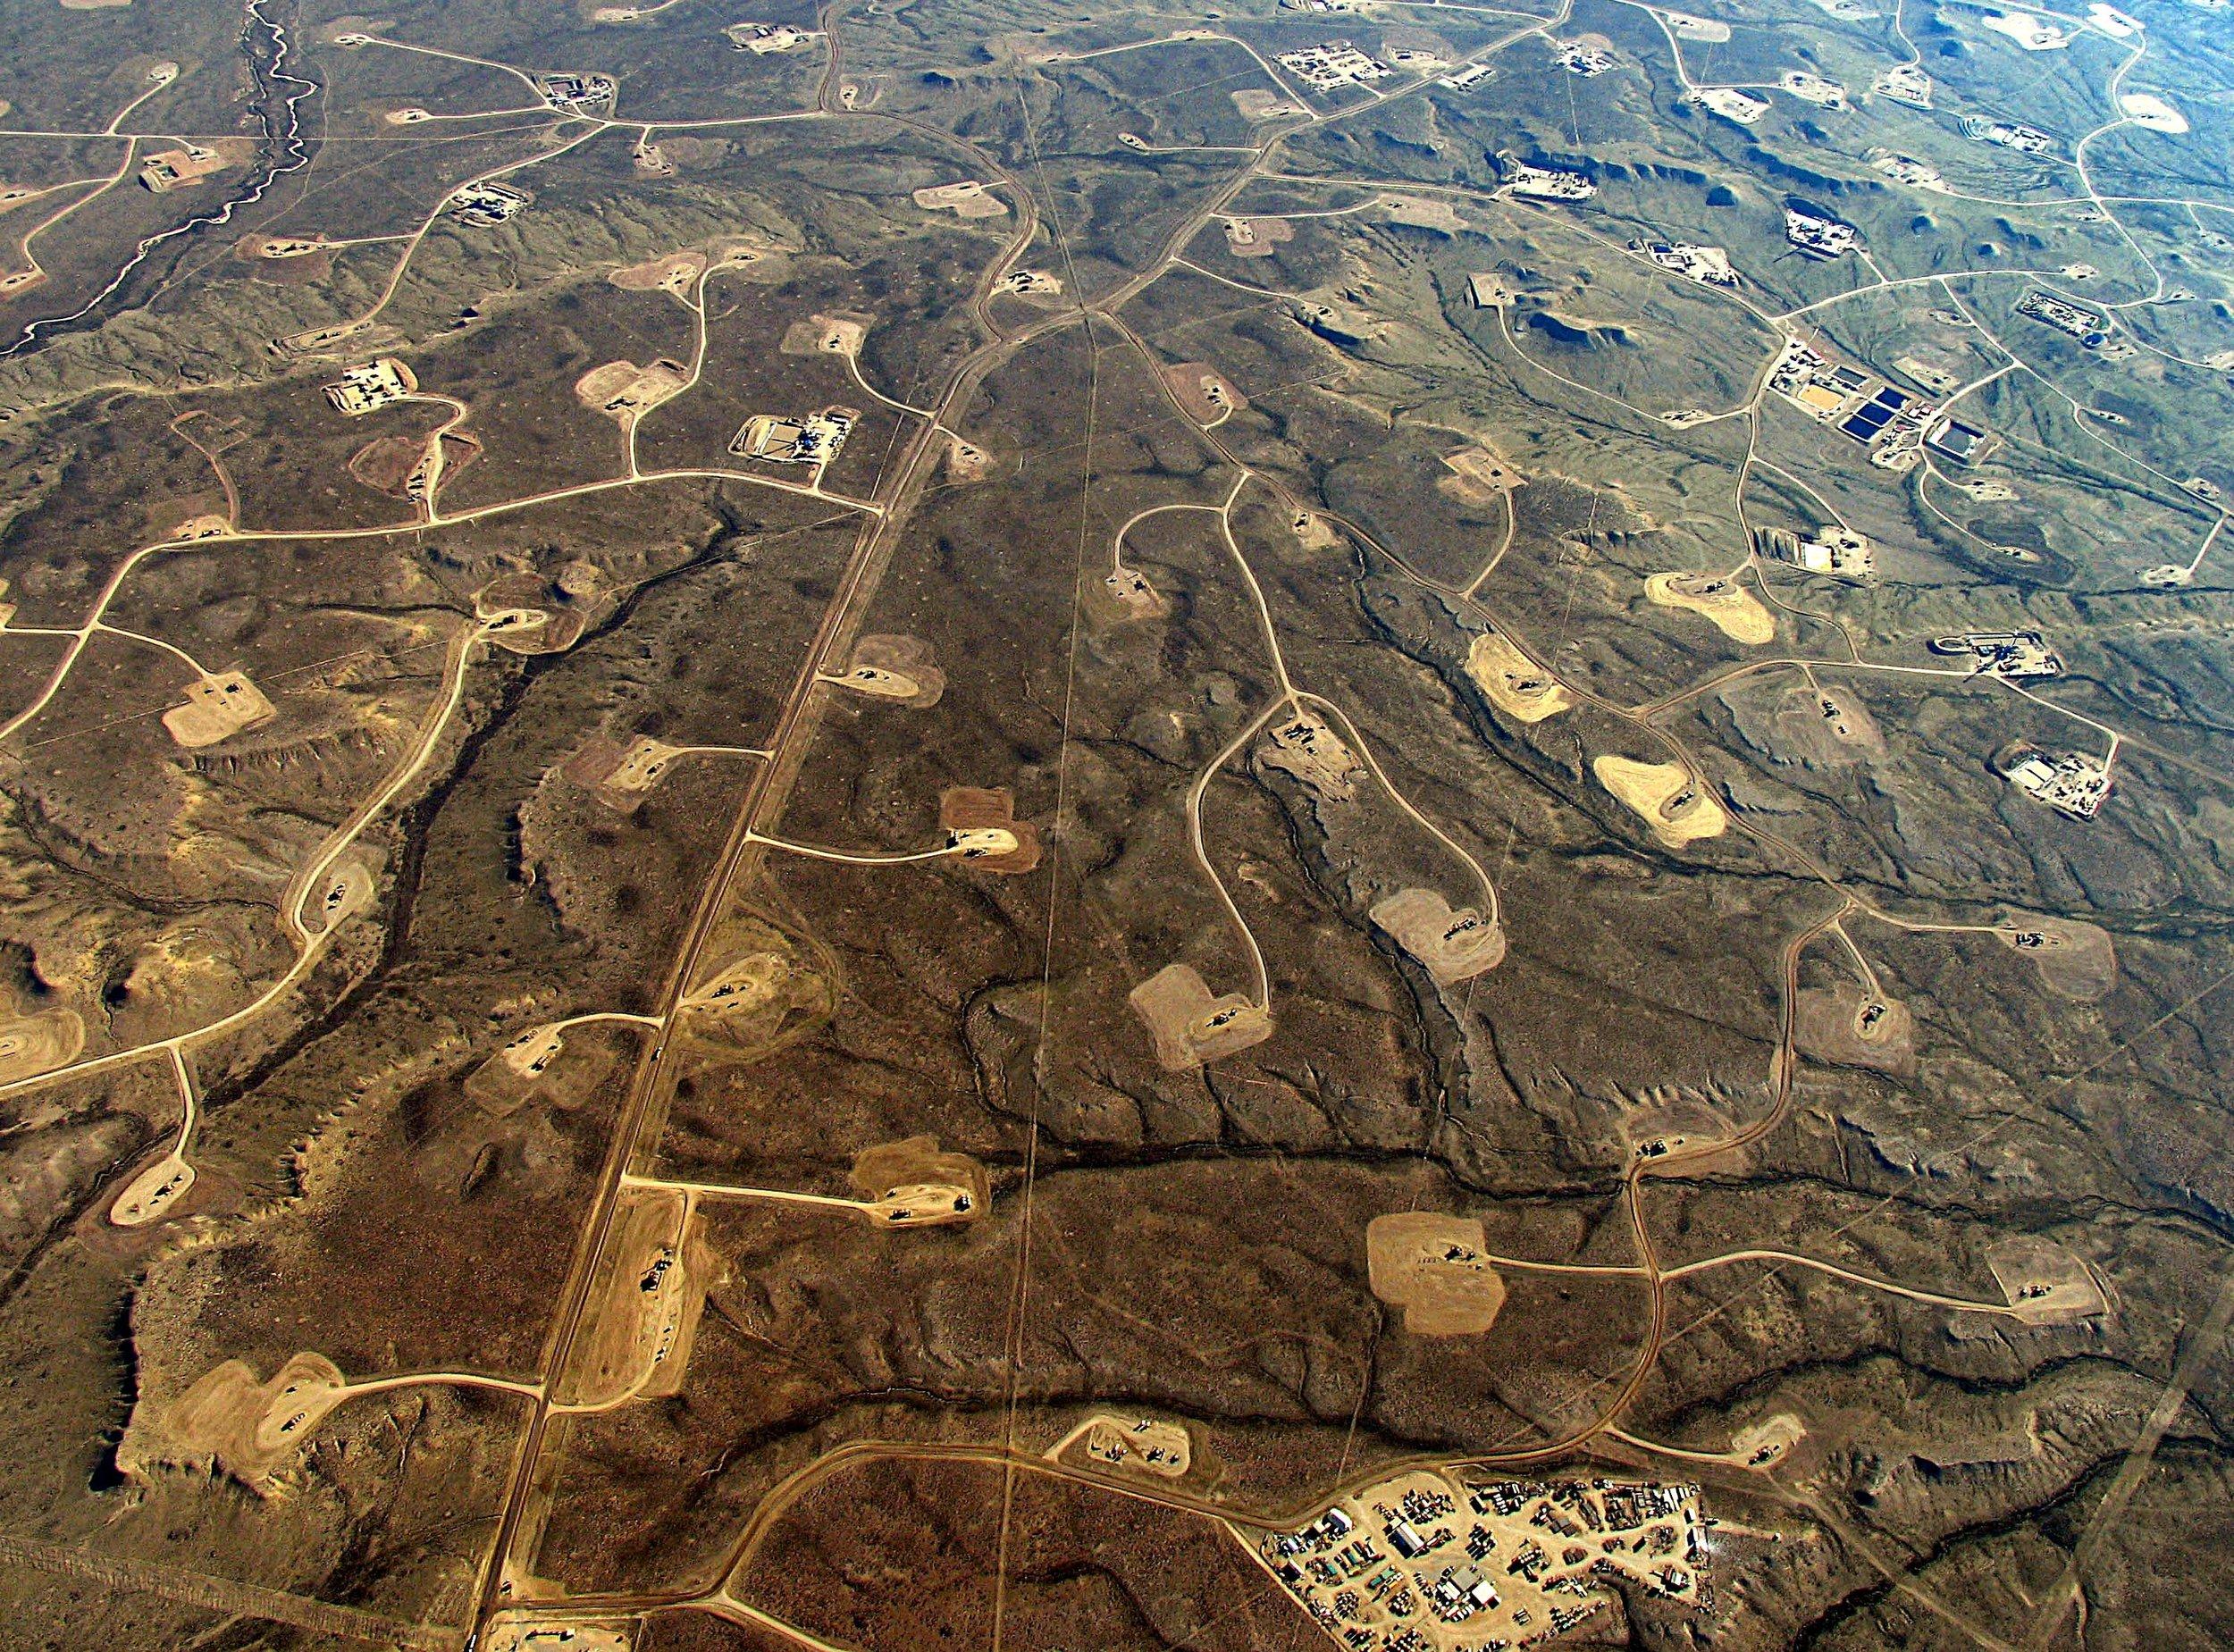 wyoming-jonah-oil-and-gas-crop.jpg